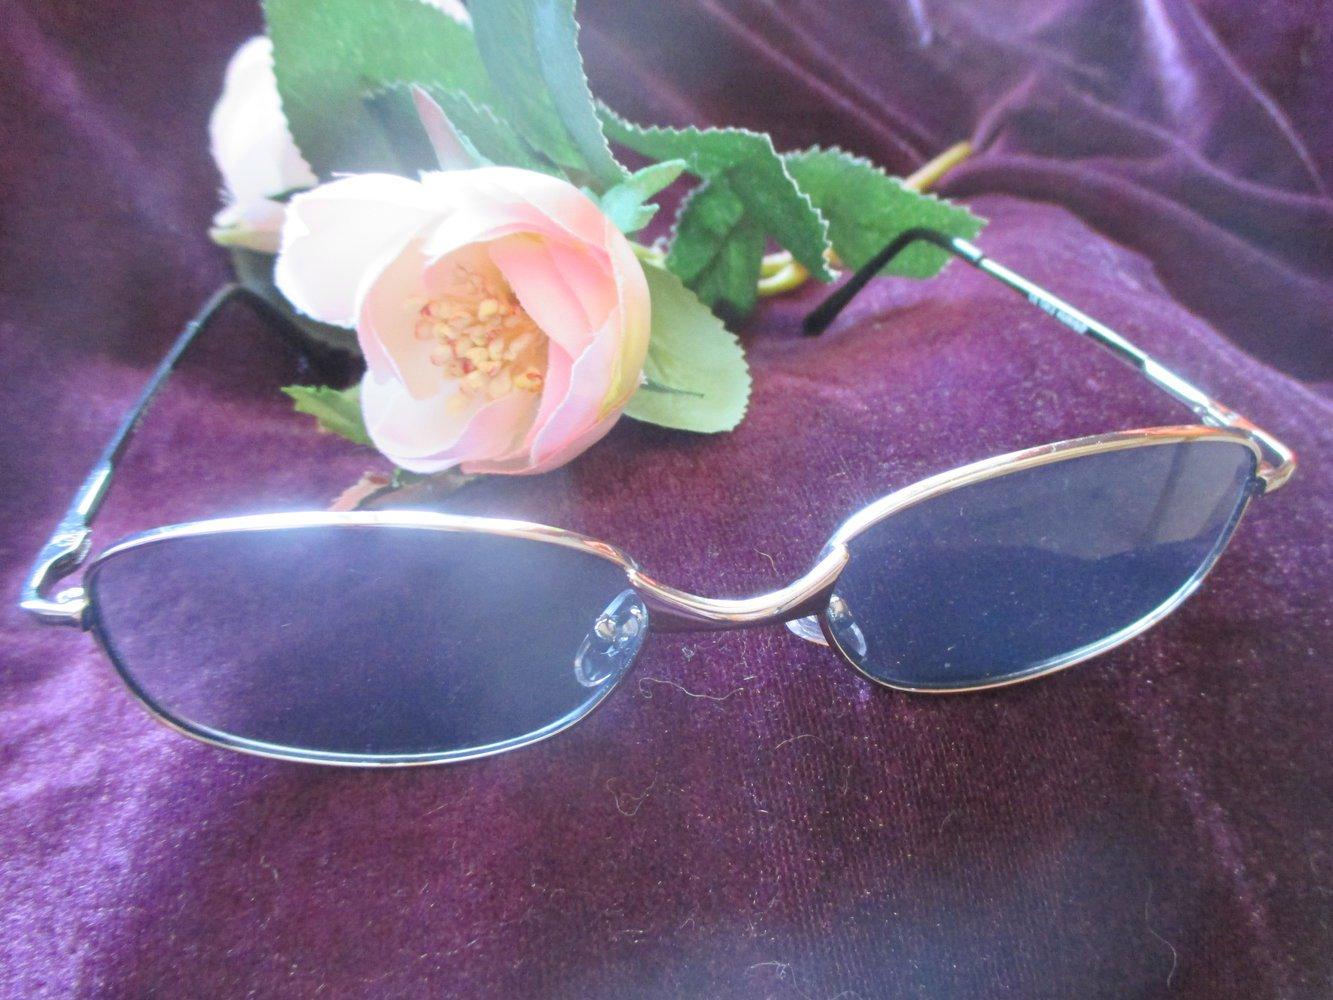 NEU * Retro * Pin up * Rockabilly Style * Sonnenbrille * Sonnen Brille * Sun Glasses 'RALPH LAUREN' Original * braun *